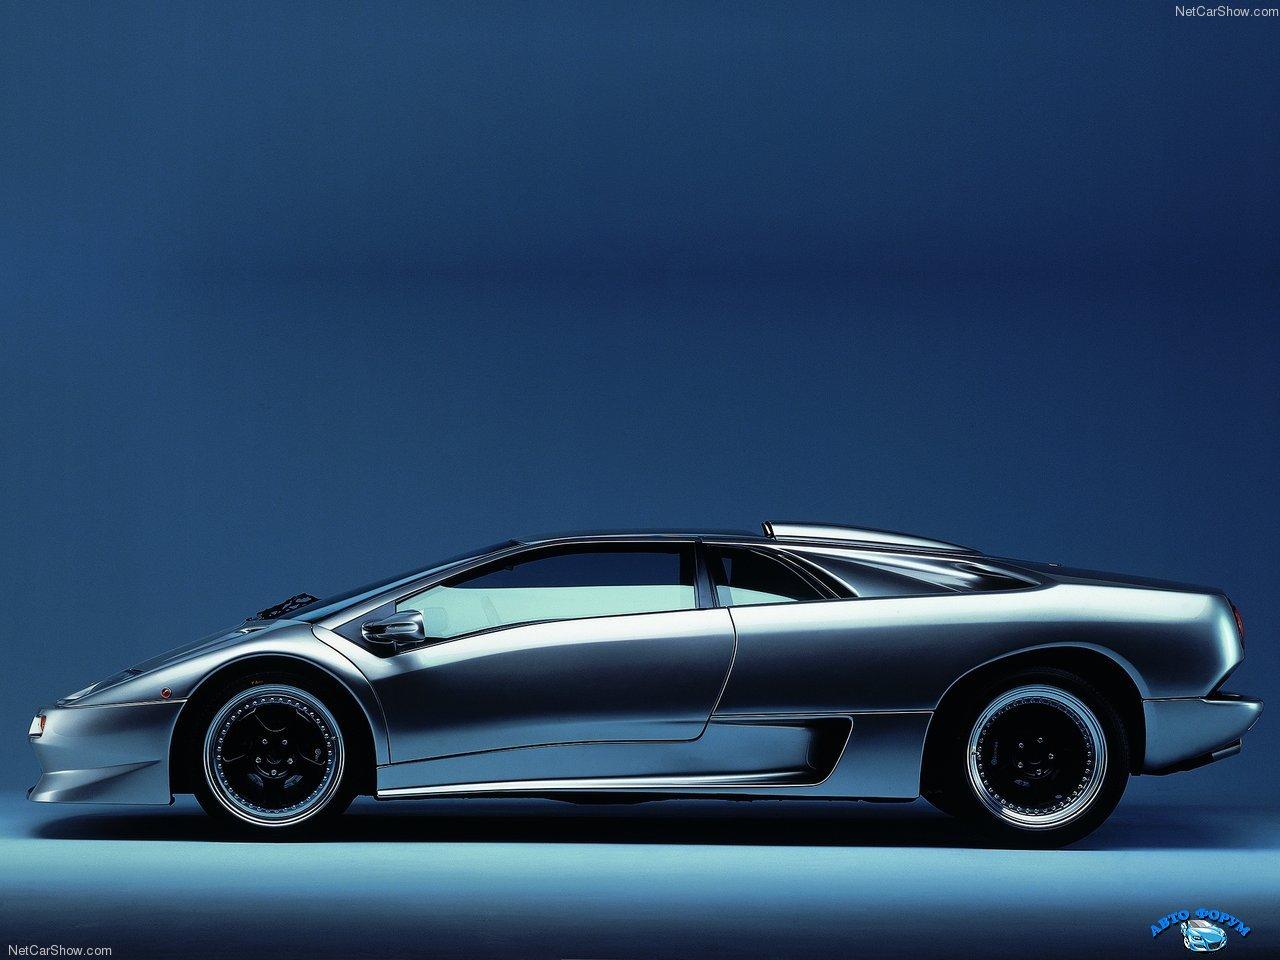 Lamborghini-Diablo_SV_1996_1280x960_wallpaper_02.jpg